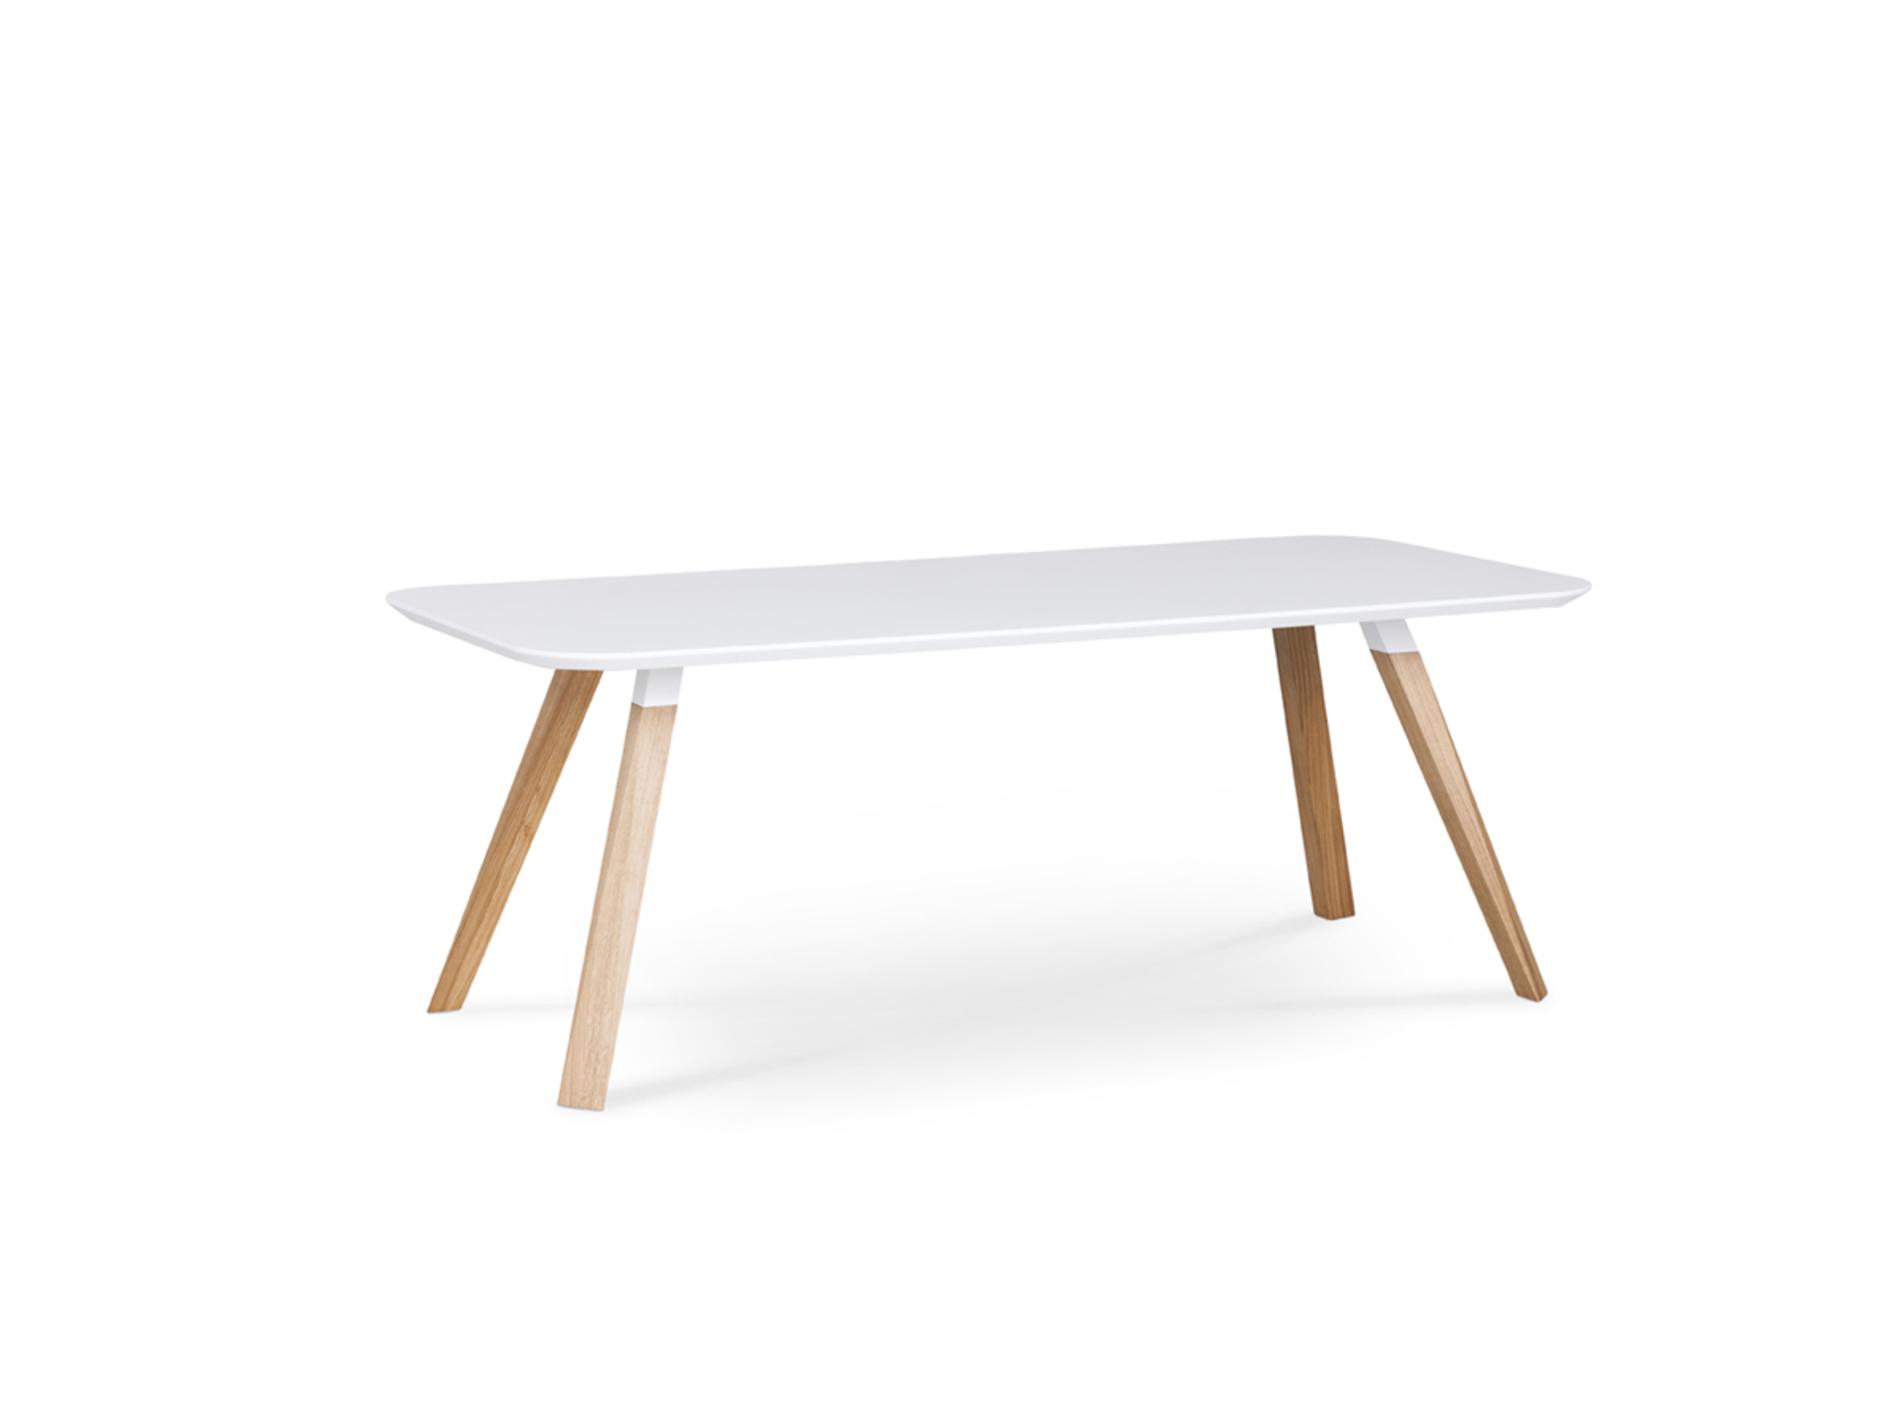 Tisch oblique prostoria 03